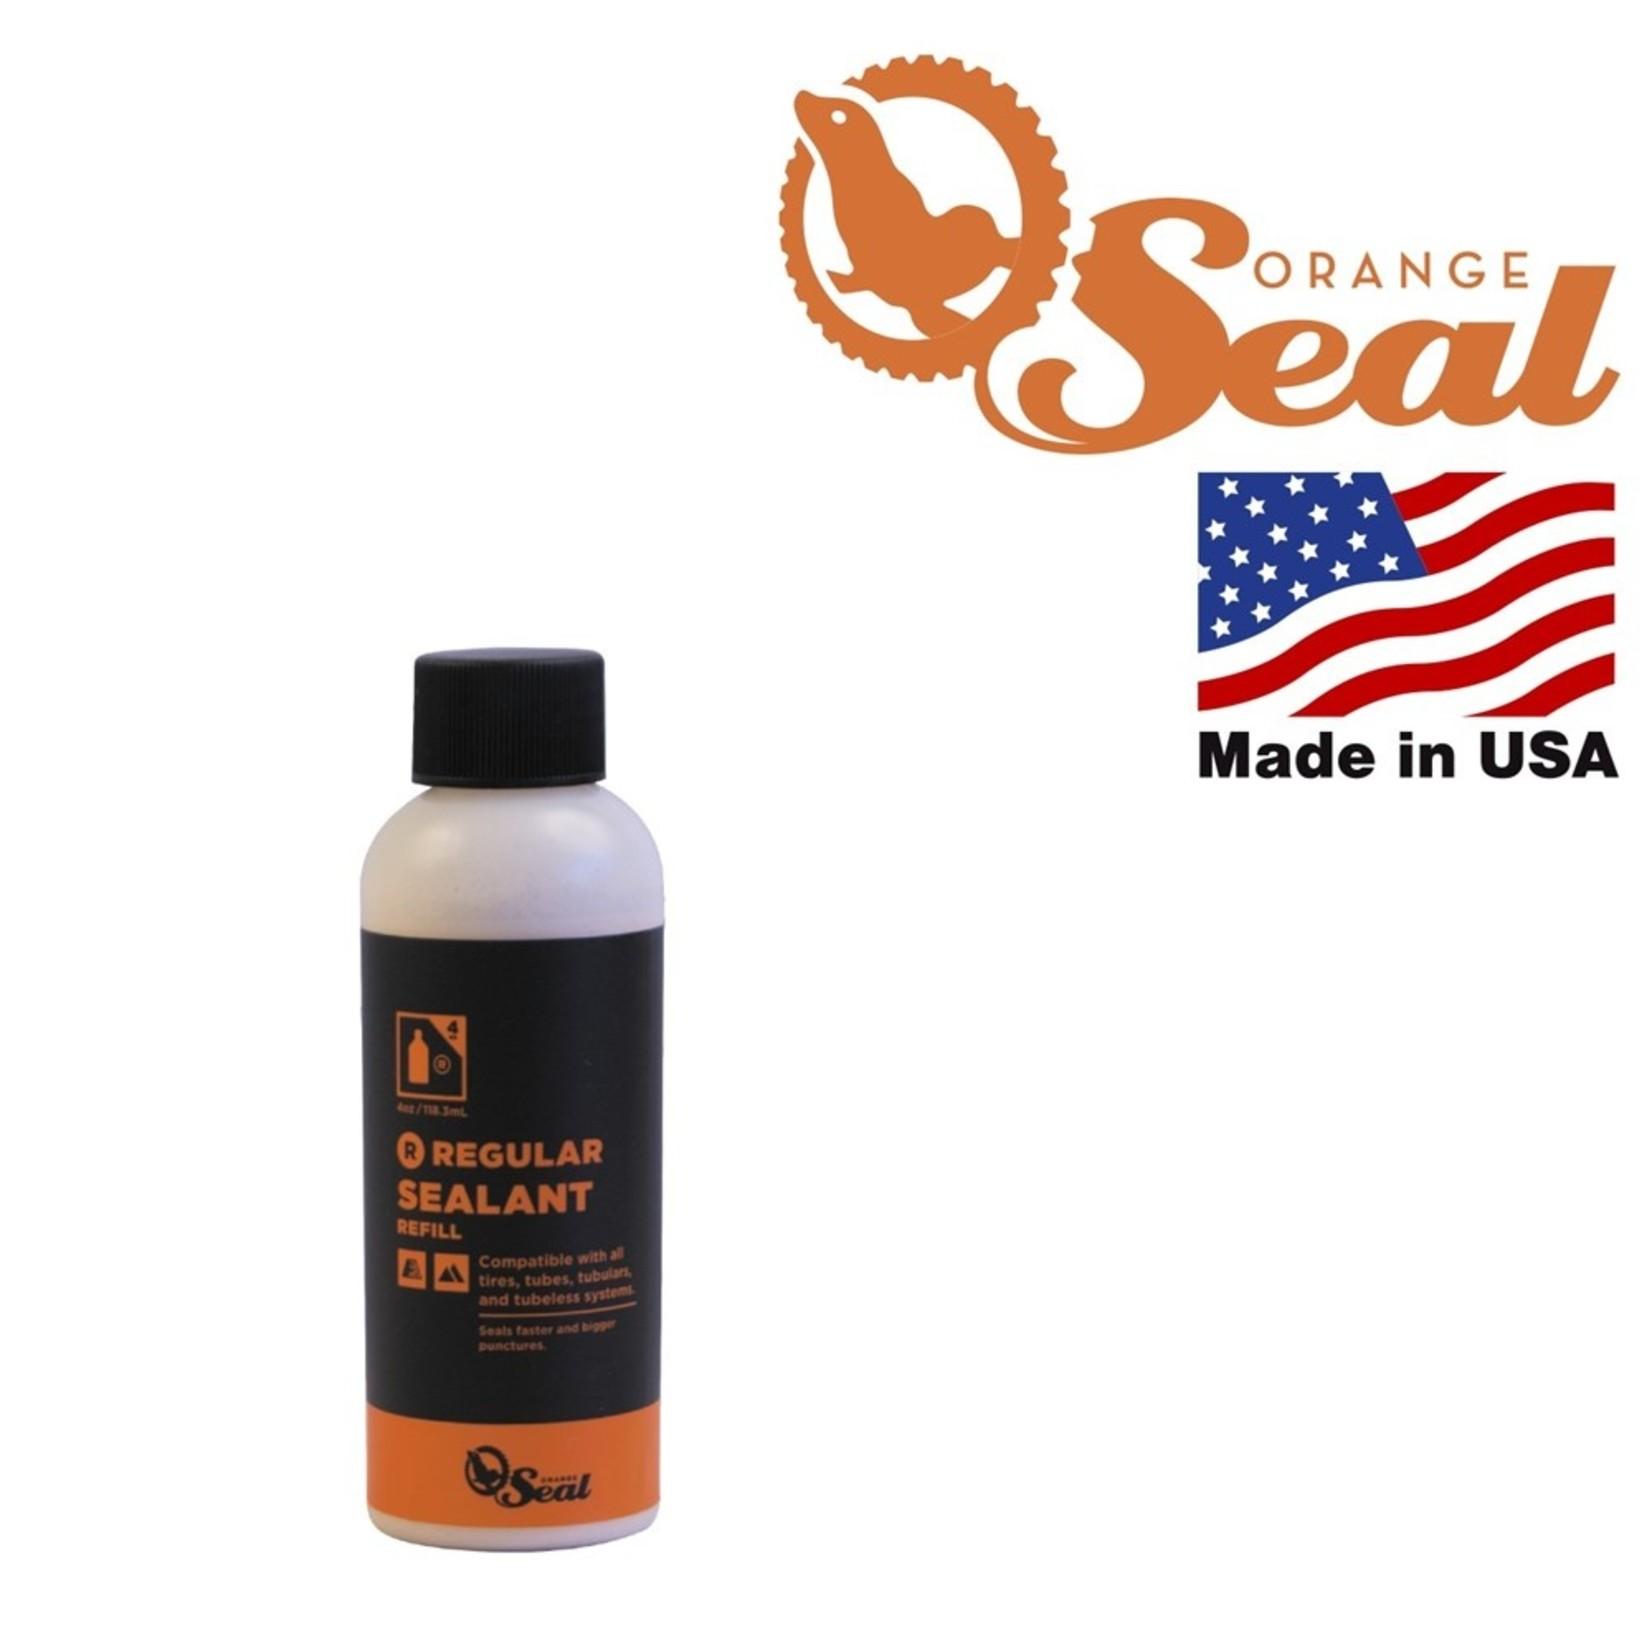 Orange Seal Orange Seal, Regular Tubeless Sealant Refill